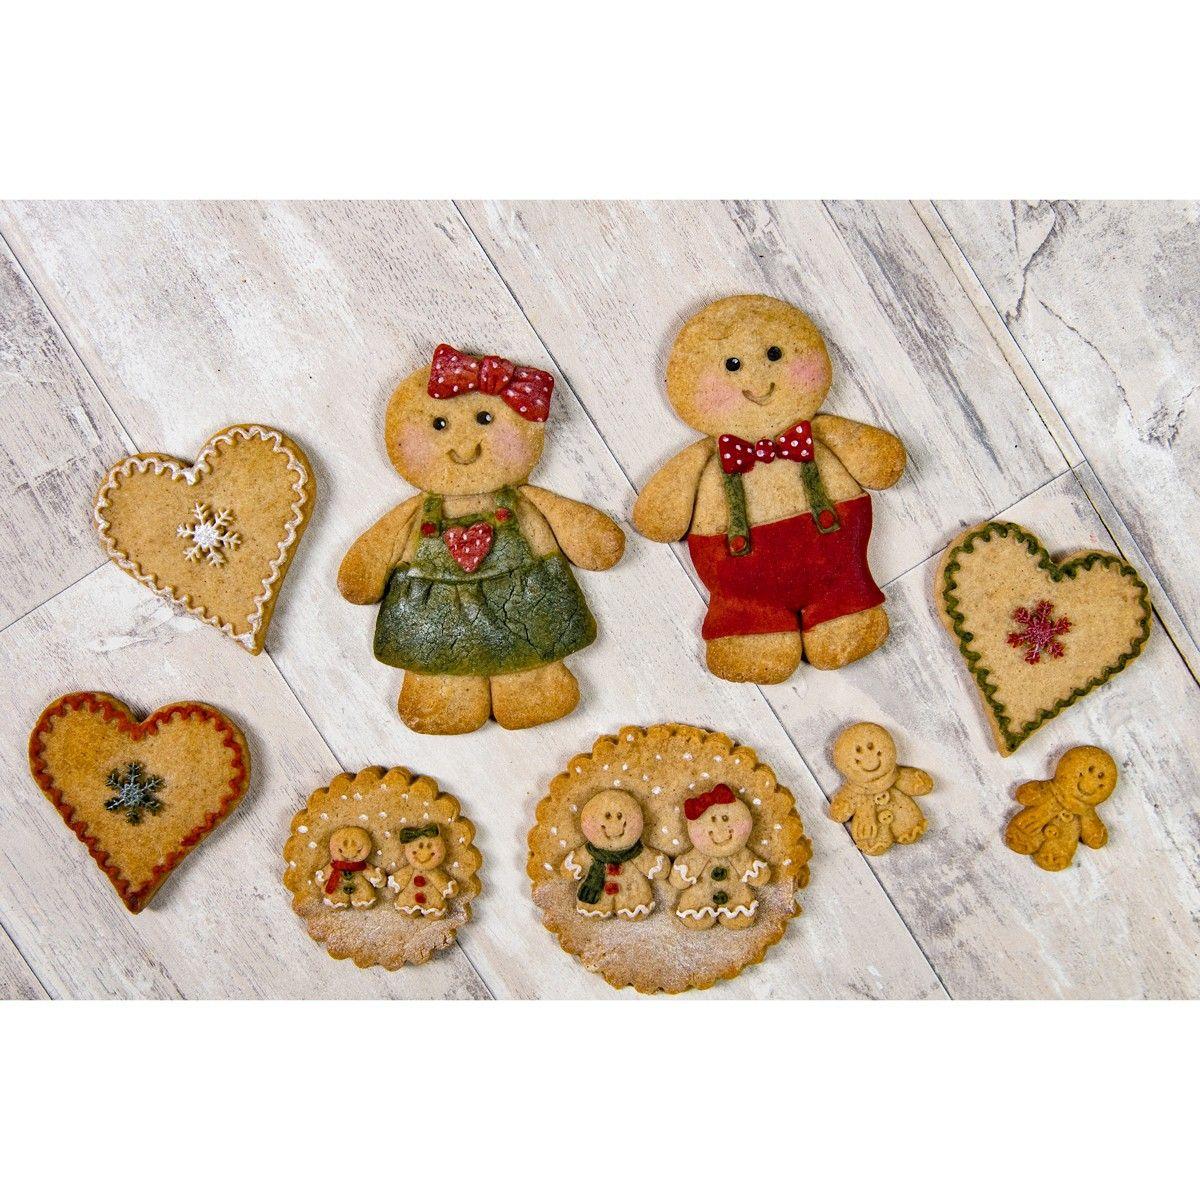 Silikonform Karen Davies | Gingerbread Cookie